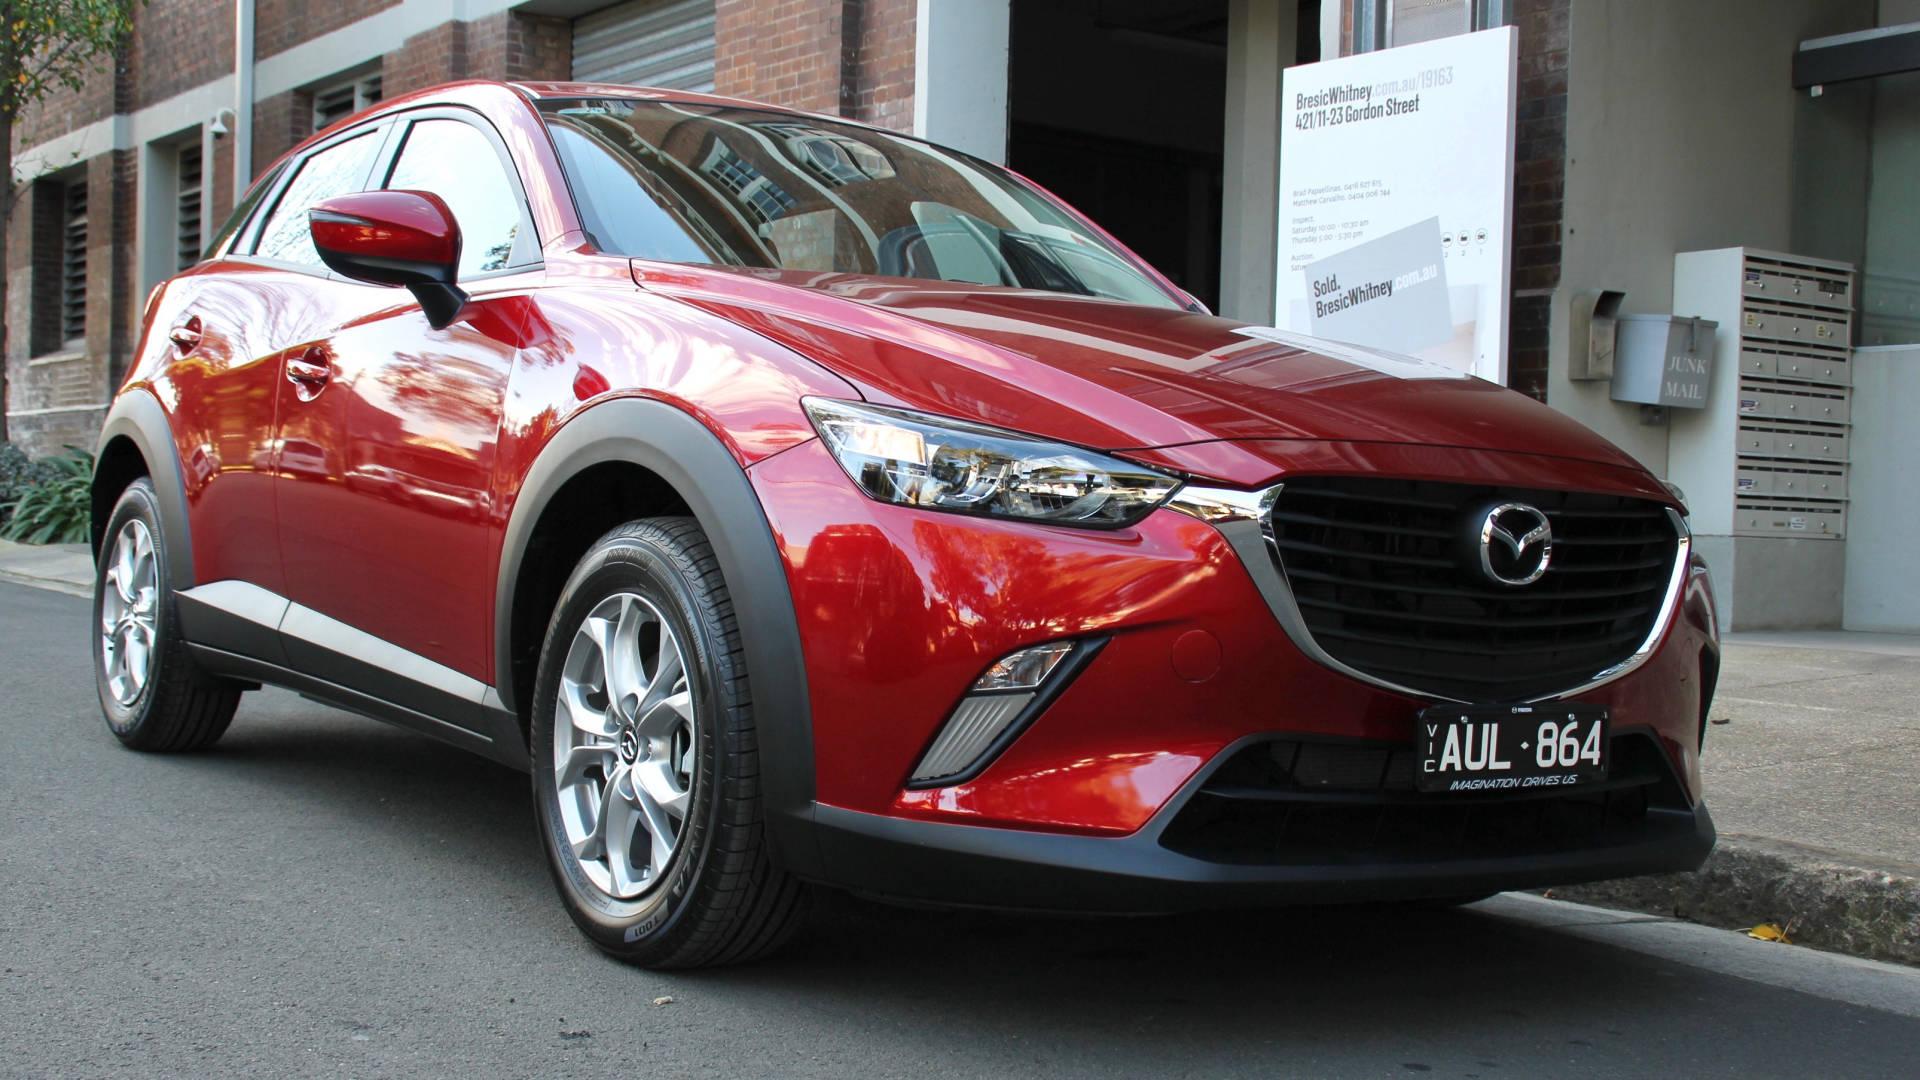 2018 Mazda CX-3 front 3/4 detail